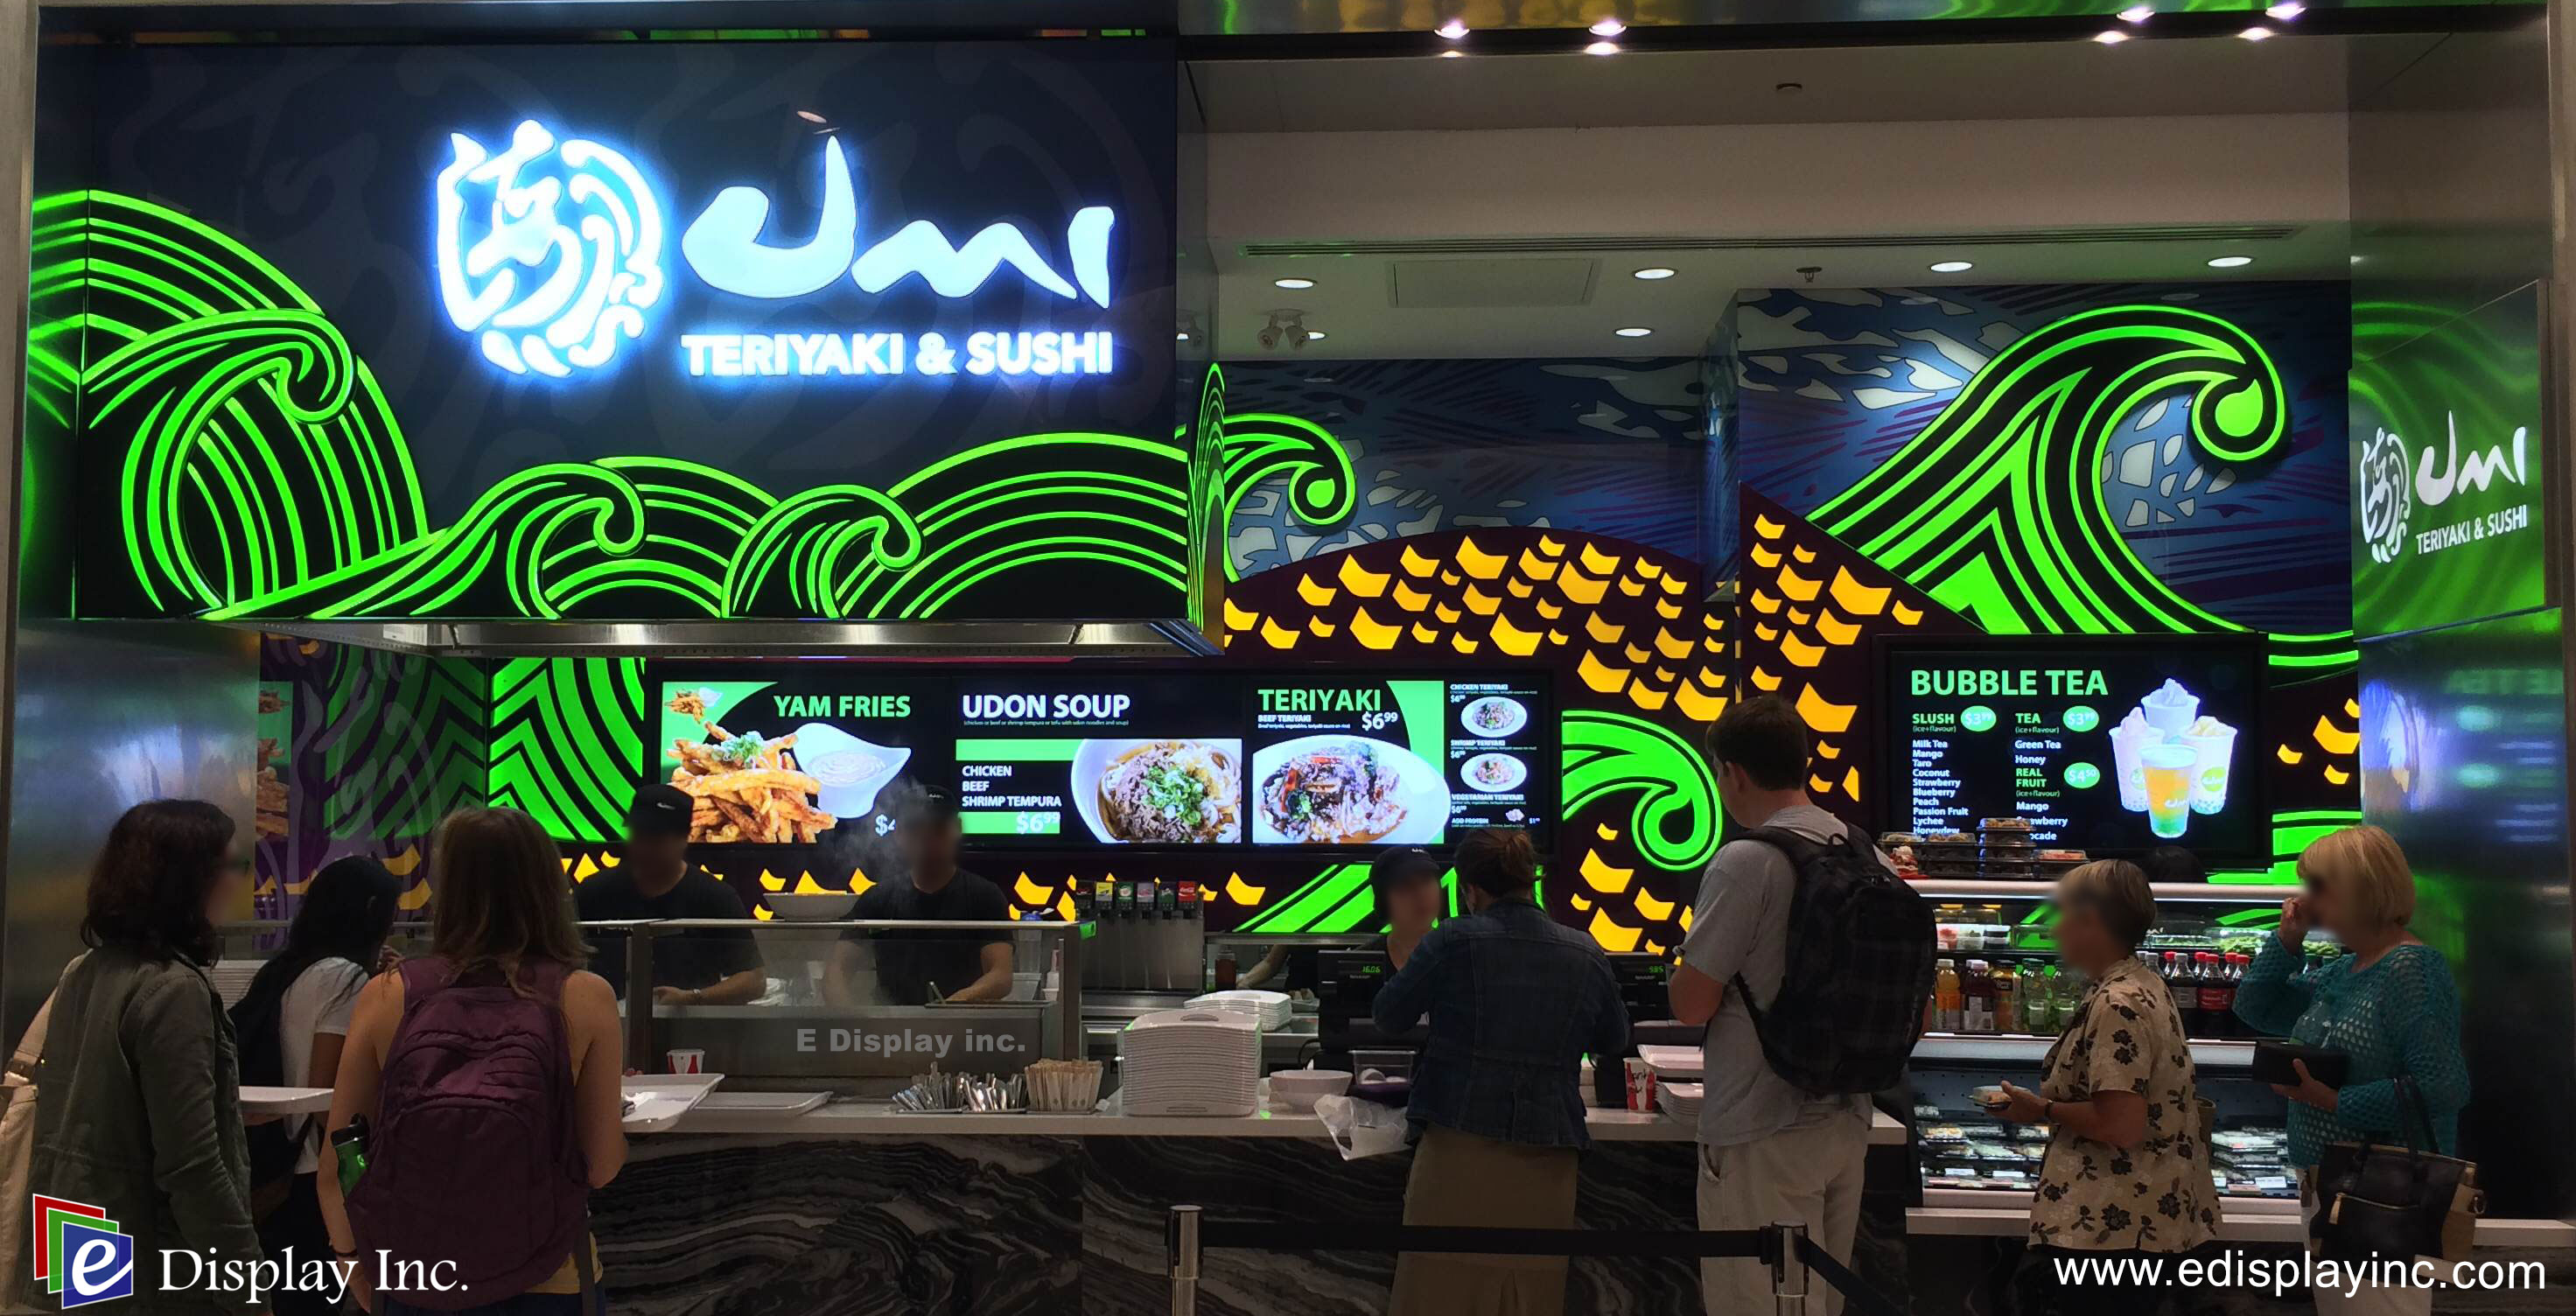 E Display Deploys Digital Menu Boards at Umi Teriyaki Sushi, Rideau Centre in Ottawa, Ontario.